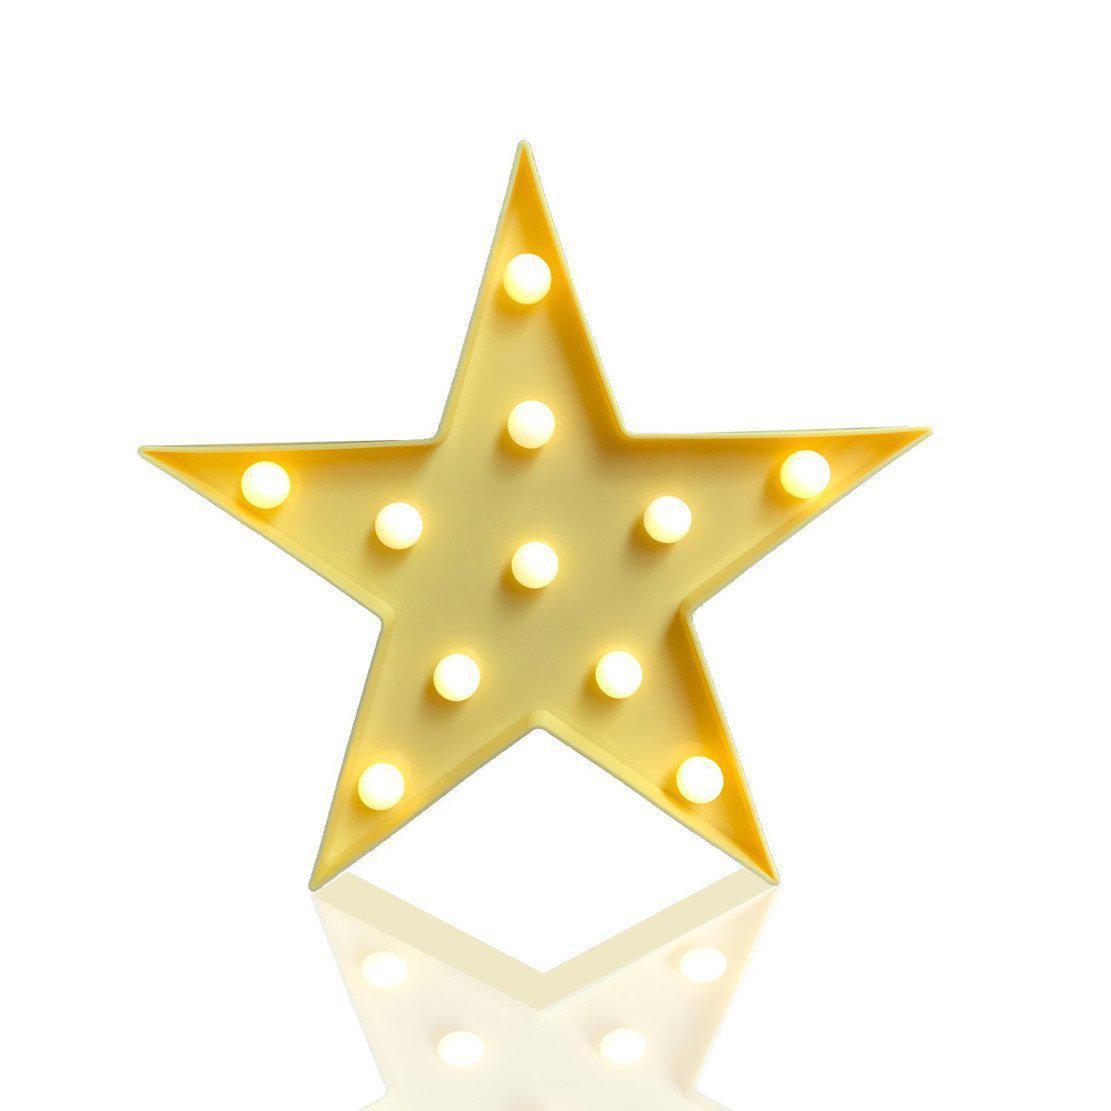 Декоративный Led светильник ночник Звездочка KS Funny Lamp Star - 145851